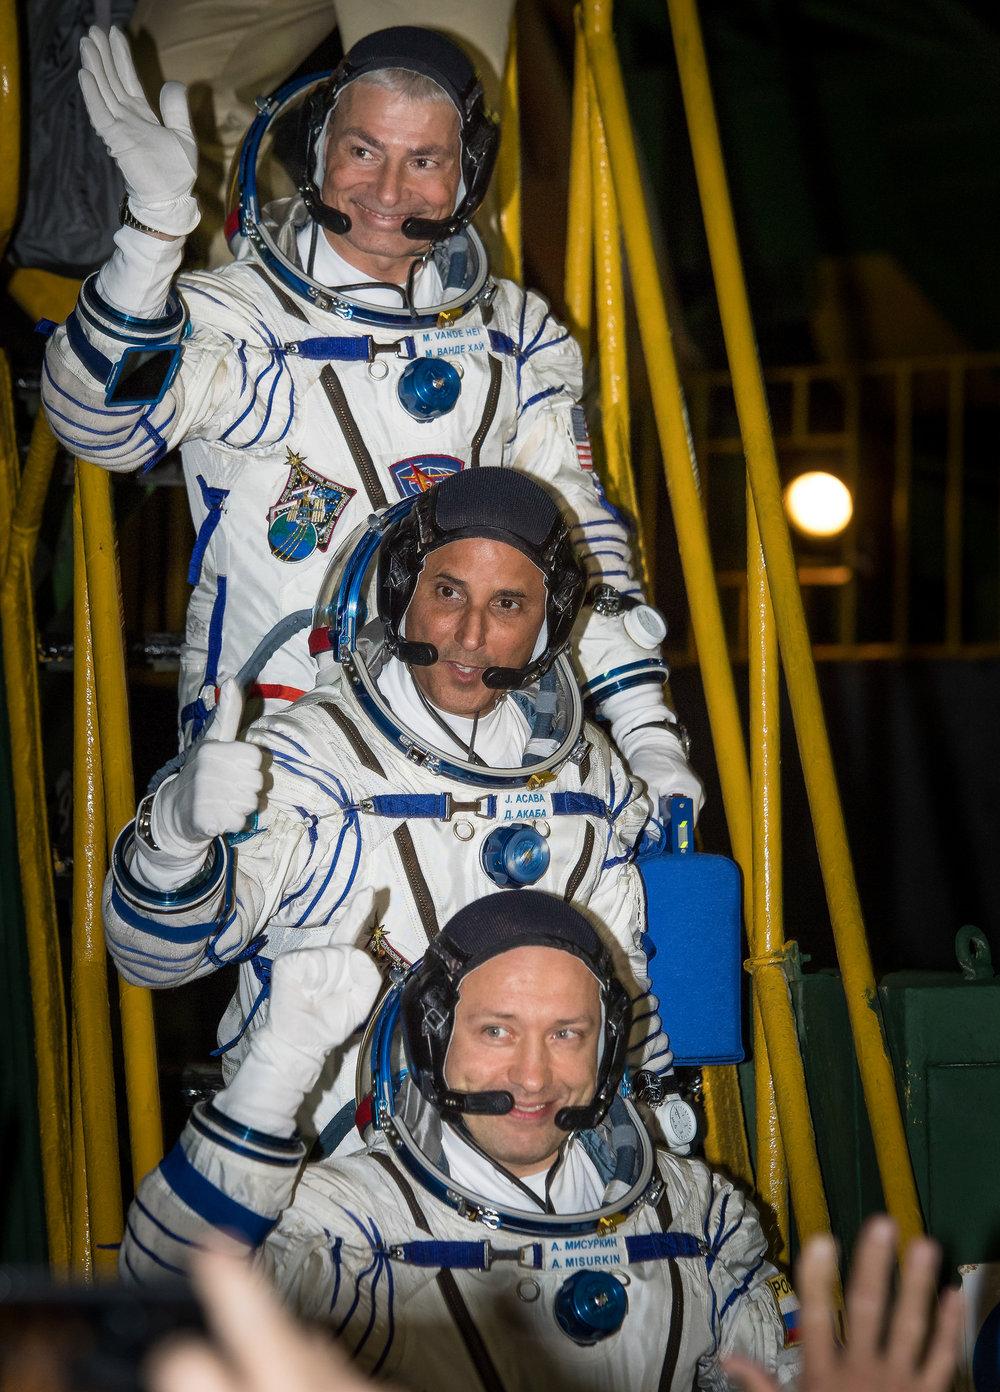 NASA astronauts Mark Vande Hei, top, and Joe Acaba, bottom, along with Russian cosmonaut Alexander Misurkin before boarding the Soyuz spacecraft. Photo Credit: Bill Ingalls / NASA